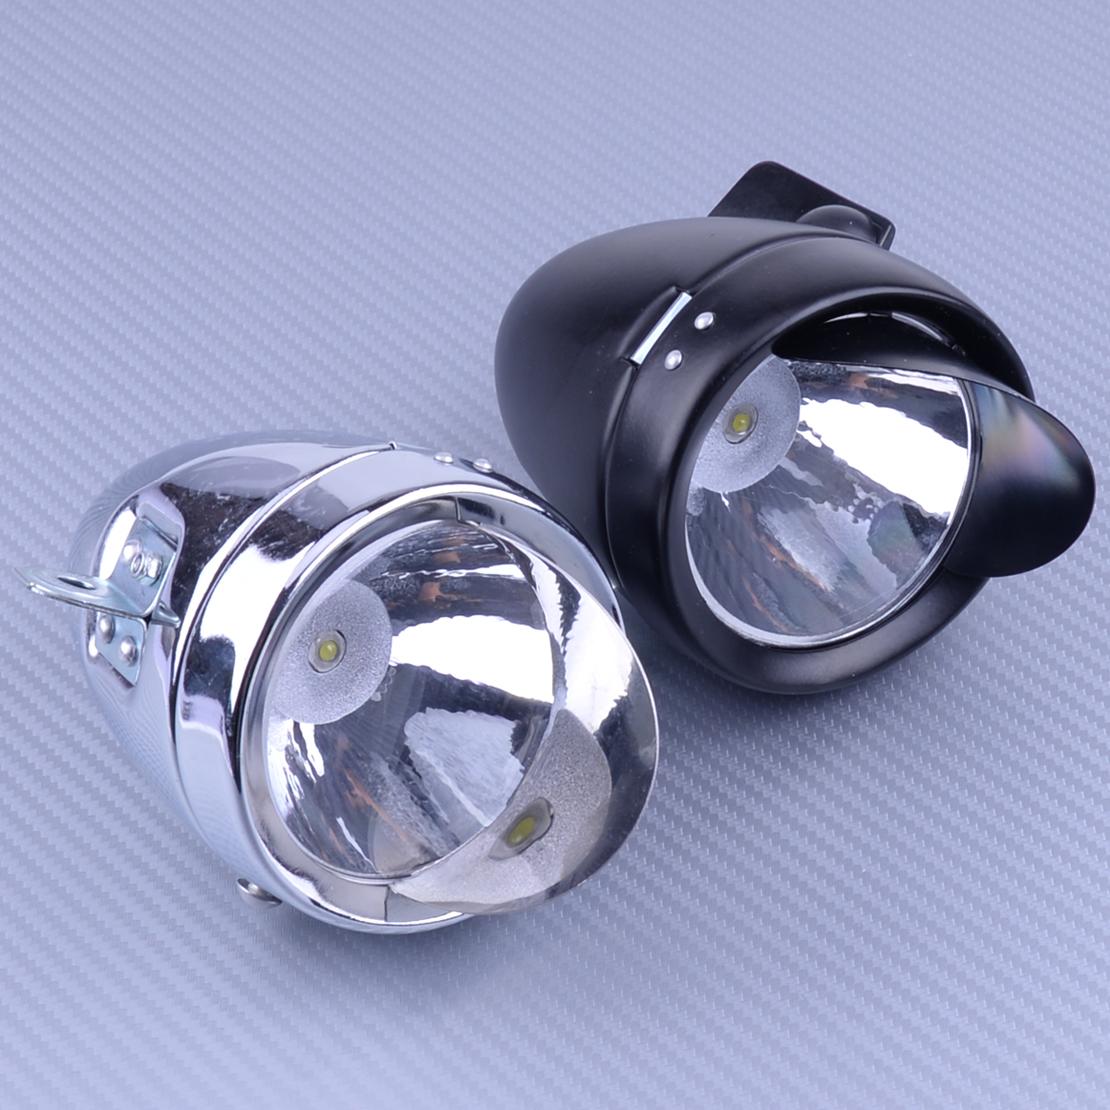 USA Vintage Bicycle Metal Chrome Headlight Bike LED Front Head Light Fog Lamp